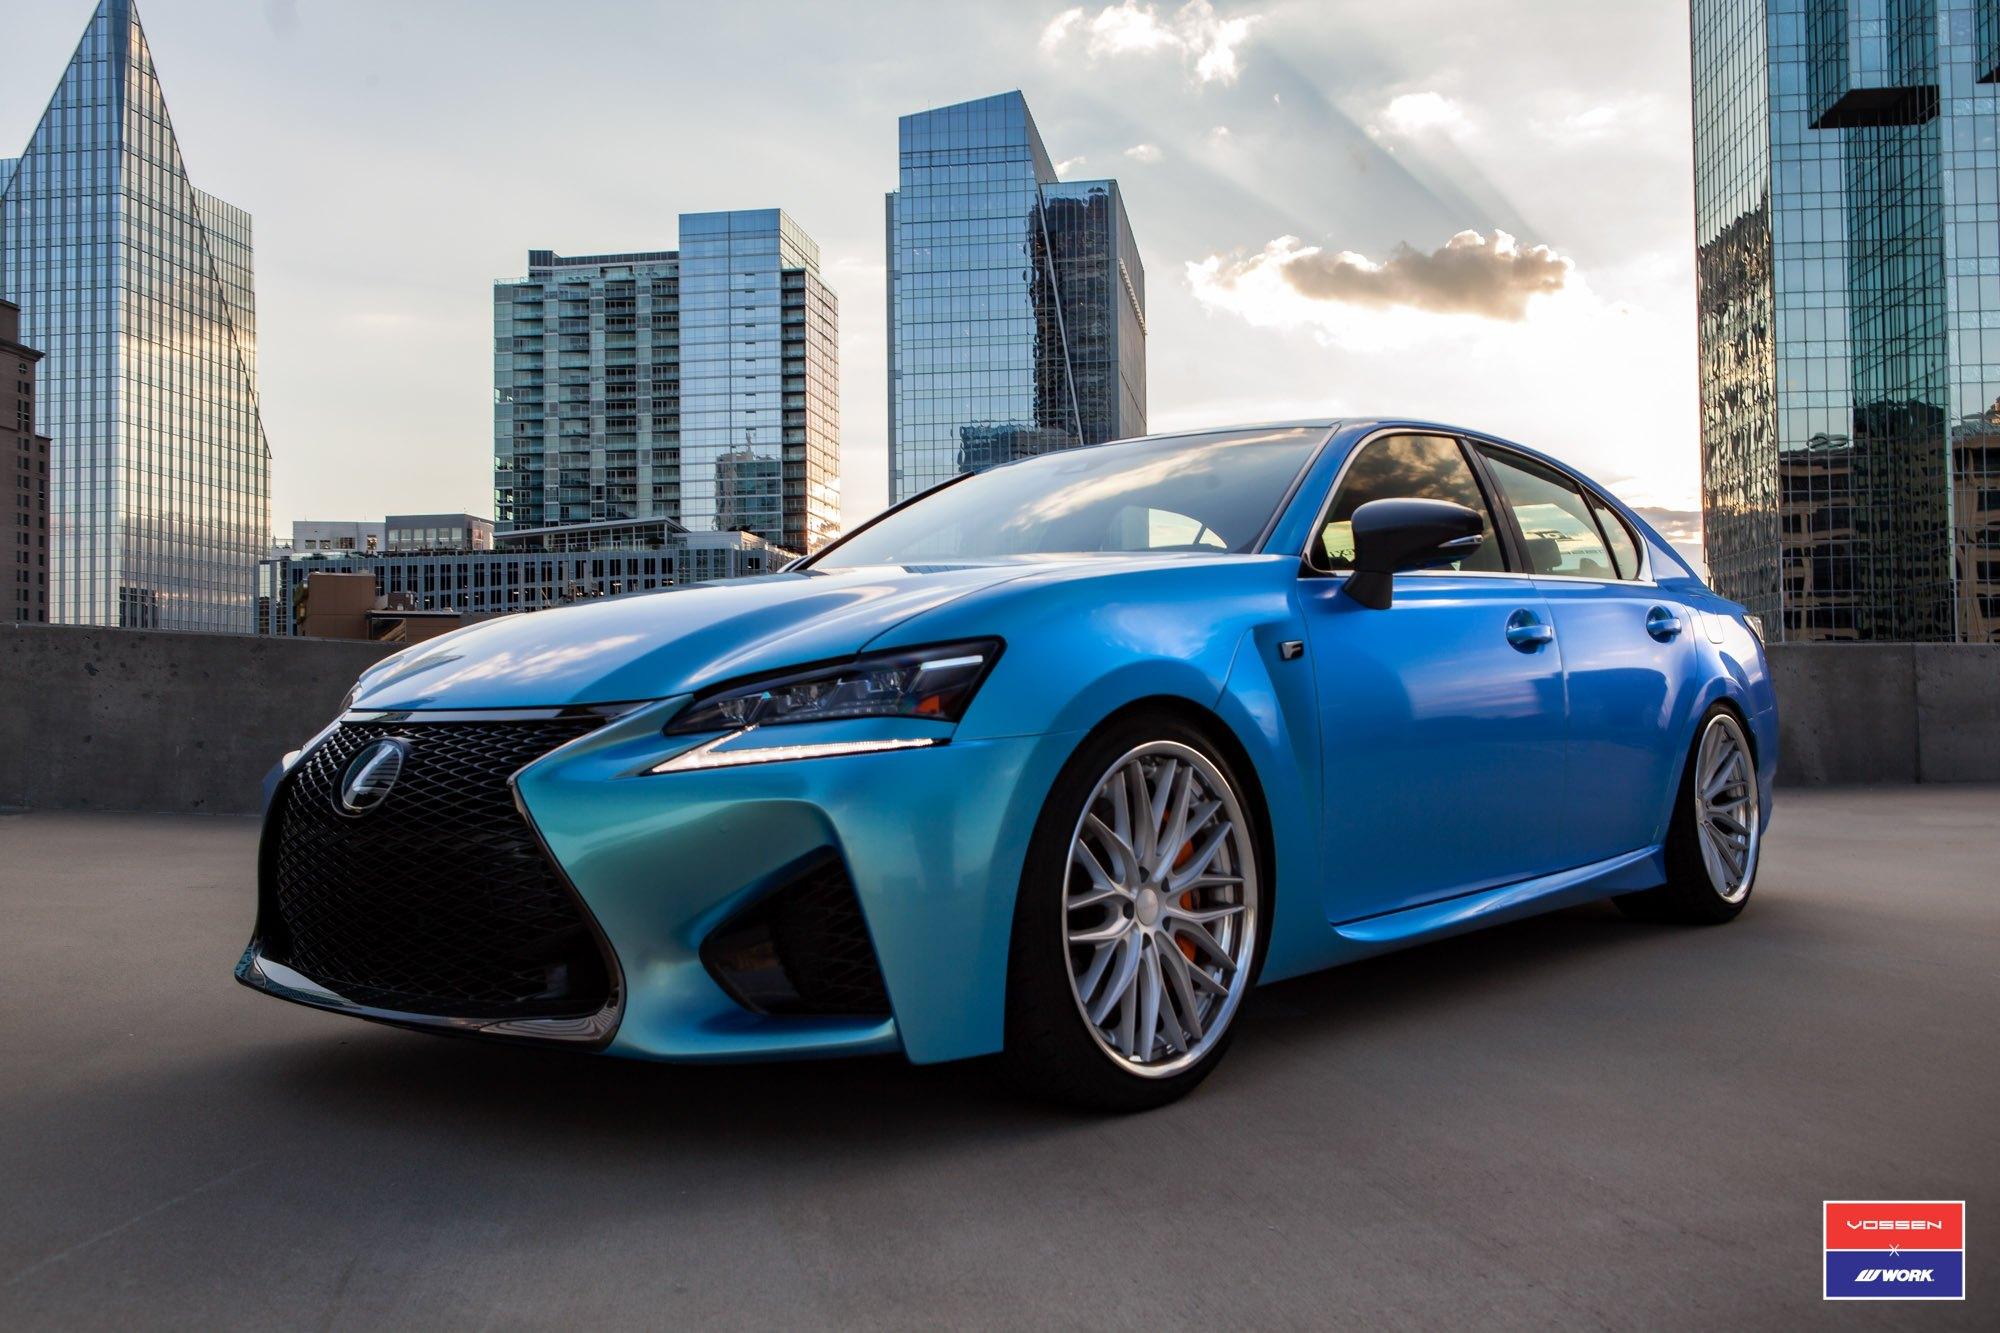 Chameleon Blue Wrapped Lexus Gs F By Vossen X Work Carid